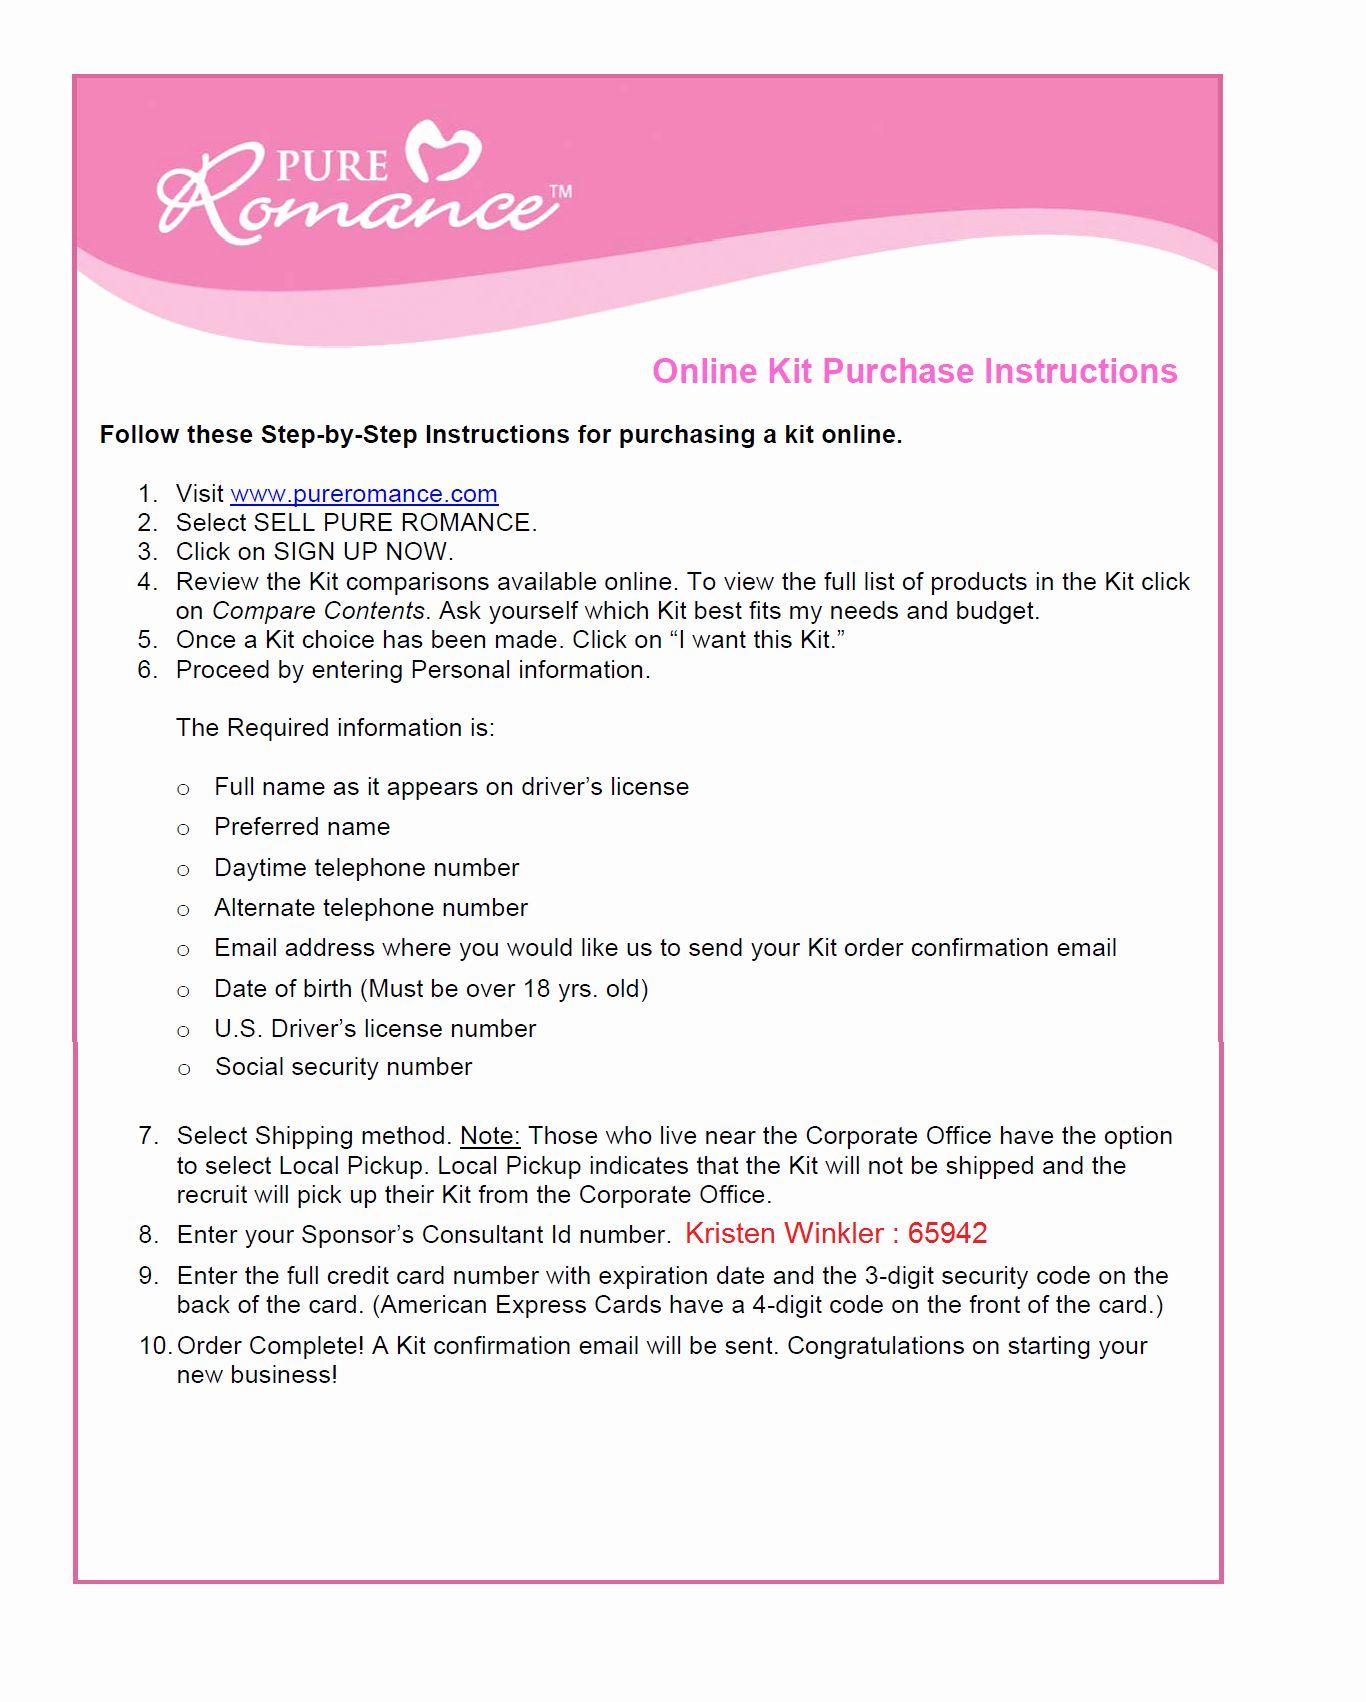 20 Pure Romance Gift Certificate Template Dannybarrantes Template Romance Gifts Gift Certificate Template Pure Romance Pure romance gift certificate template